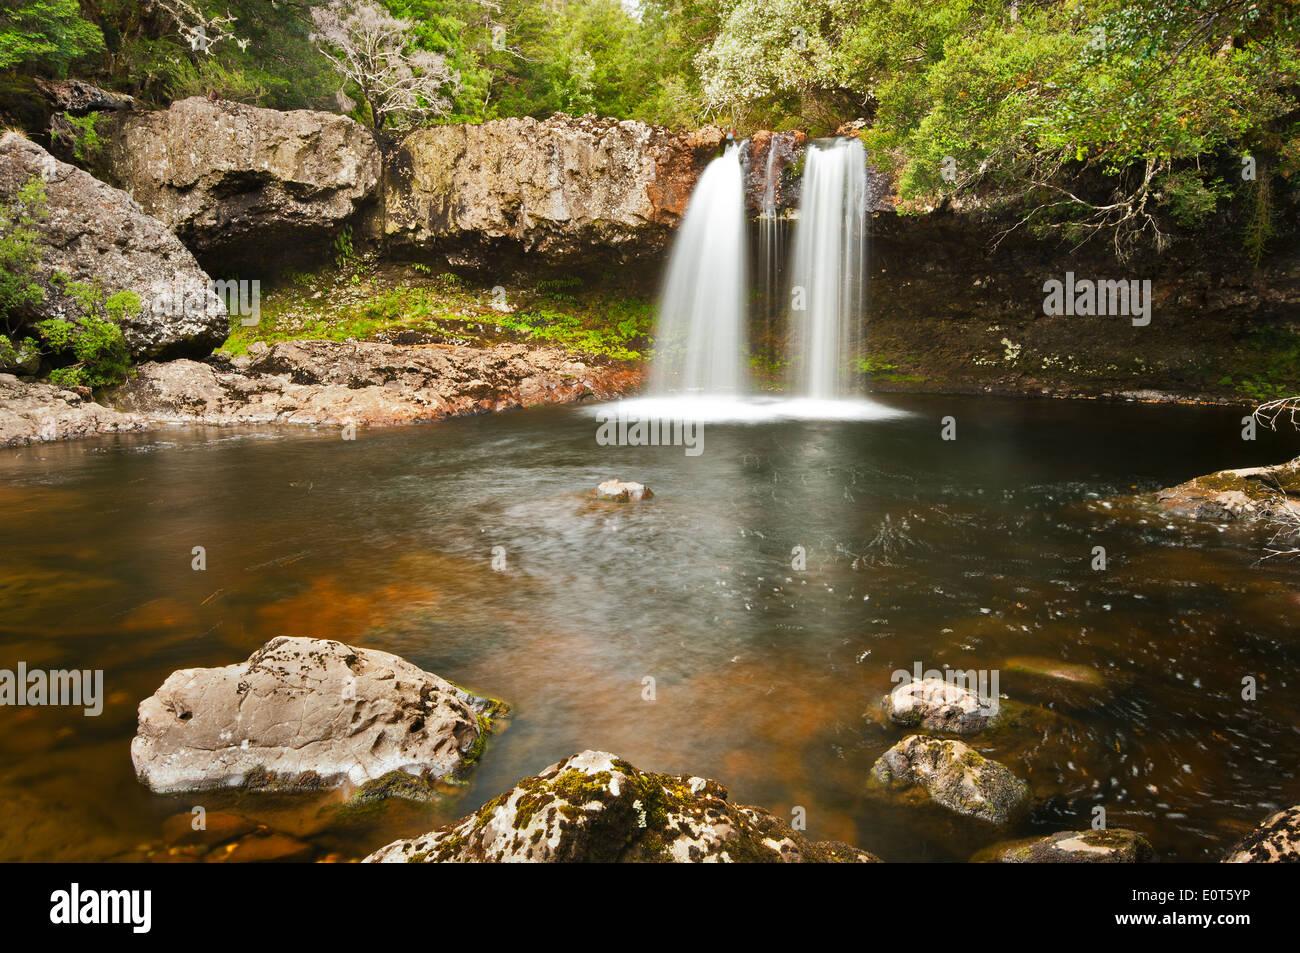 Knyvet Falls in Cradle Mountain National Park. - Stock Image